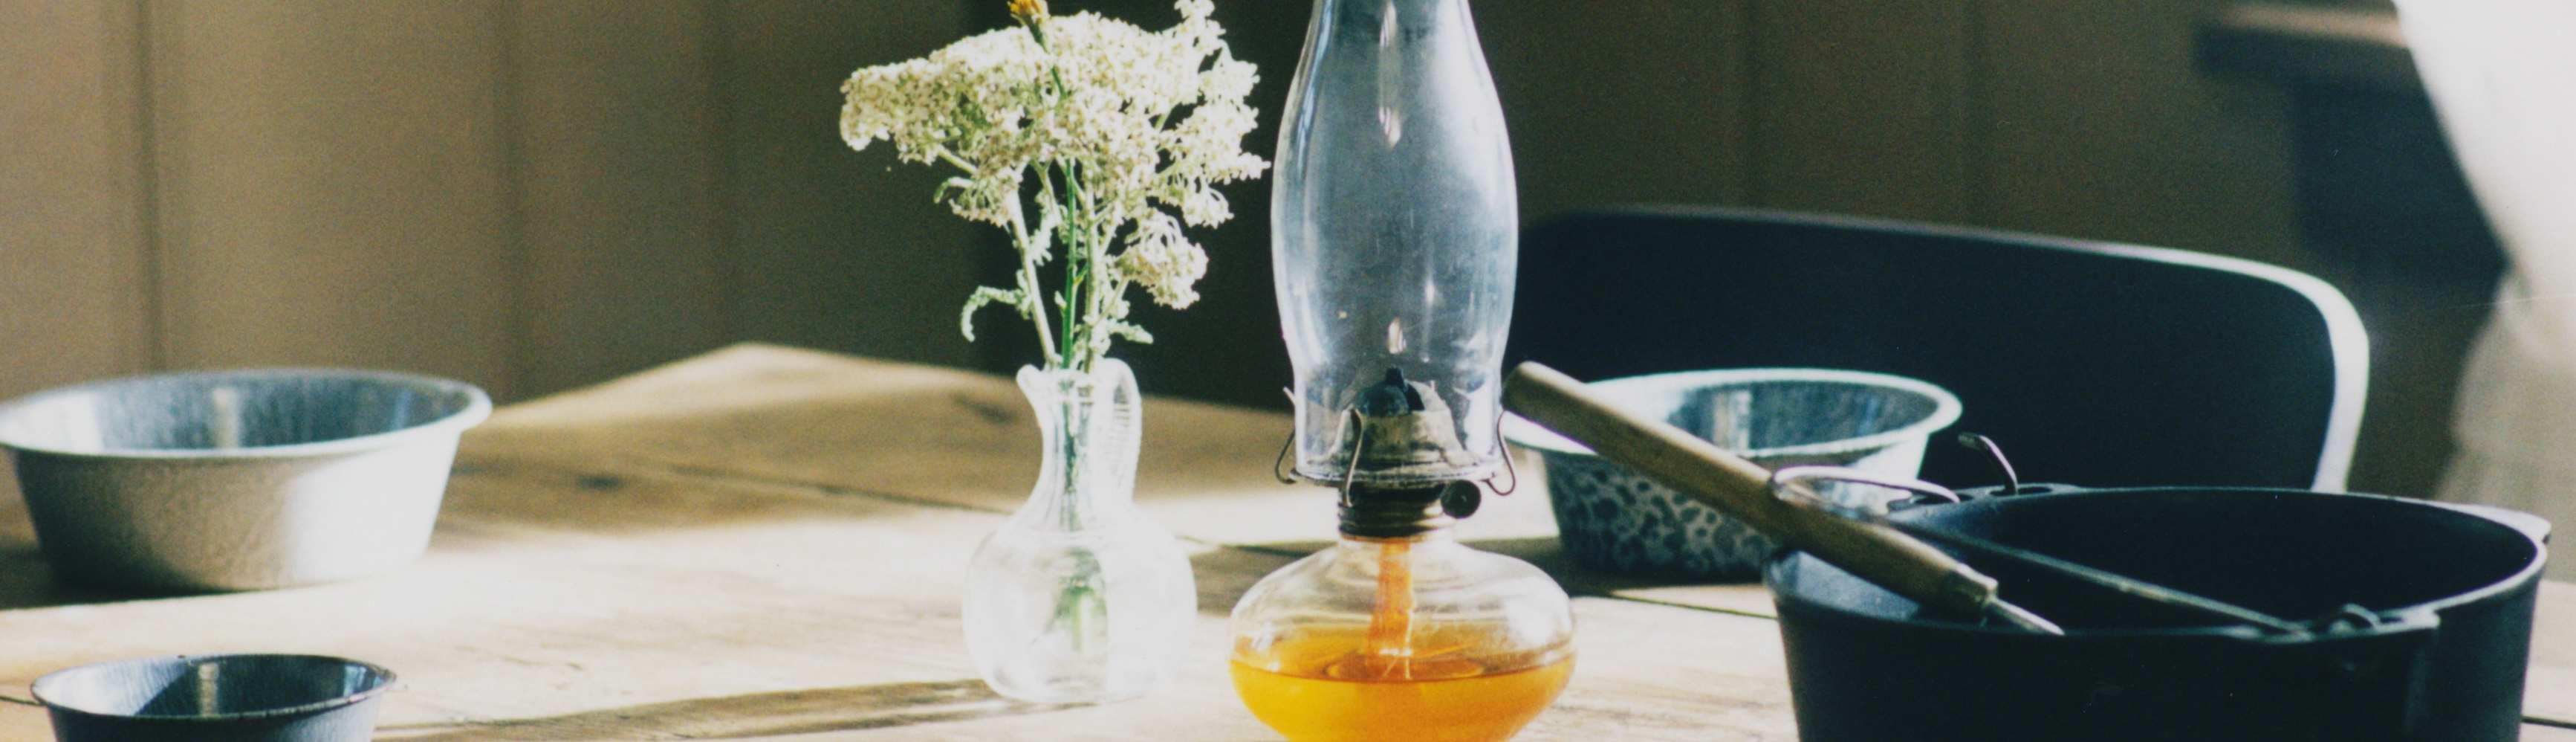 Lamp - Erika Surat Andersen